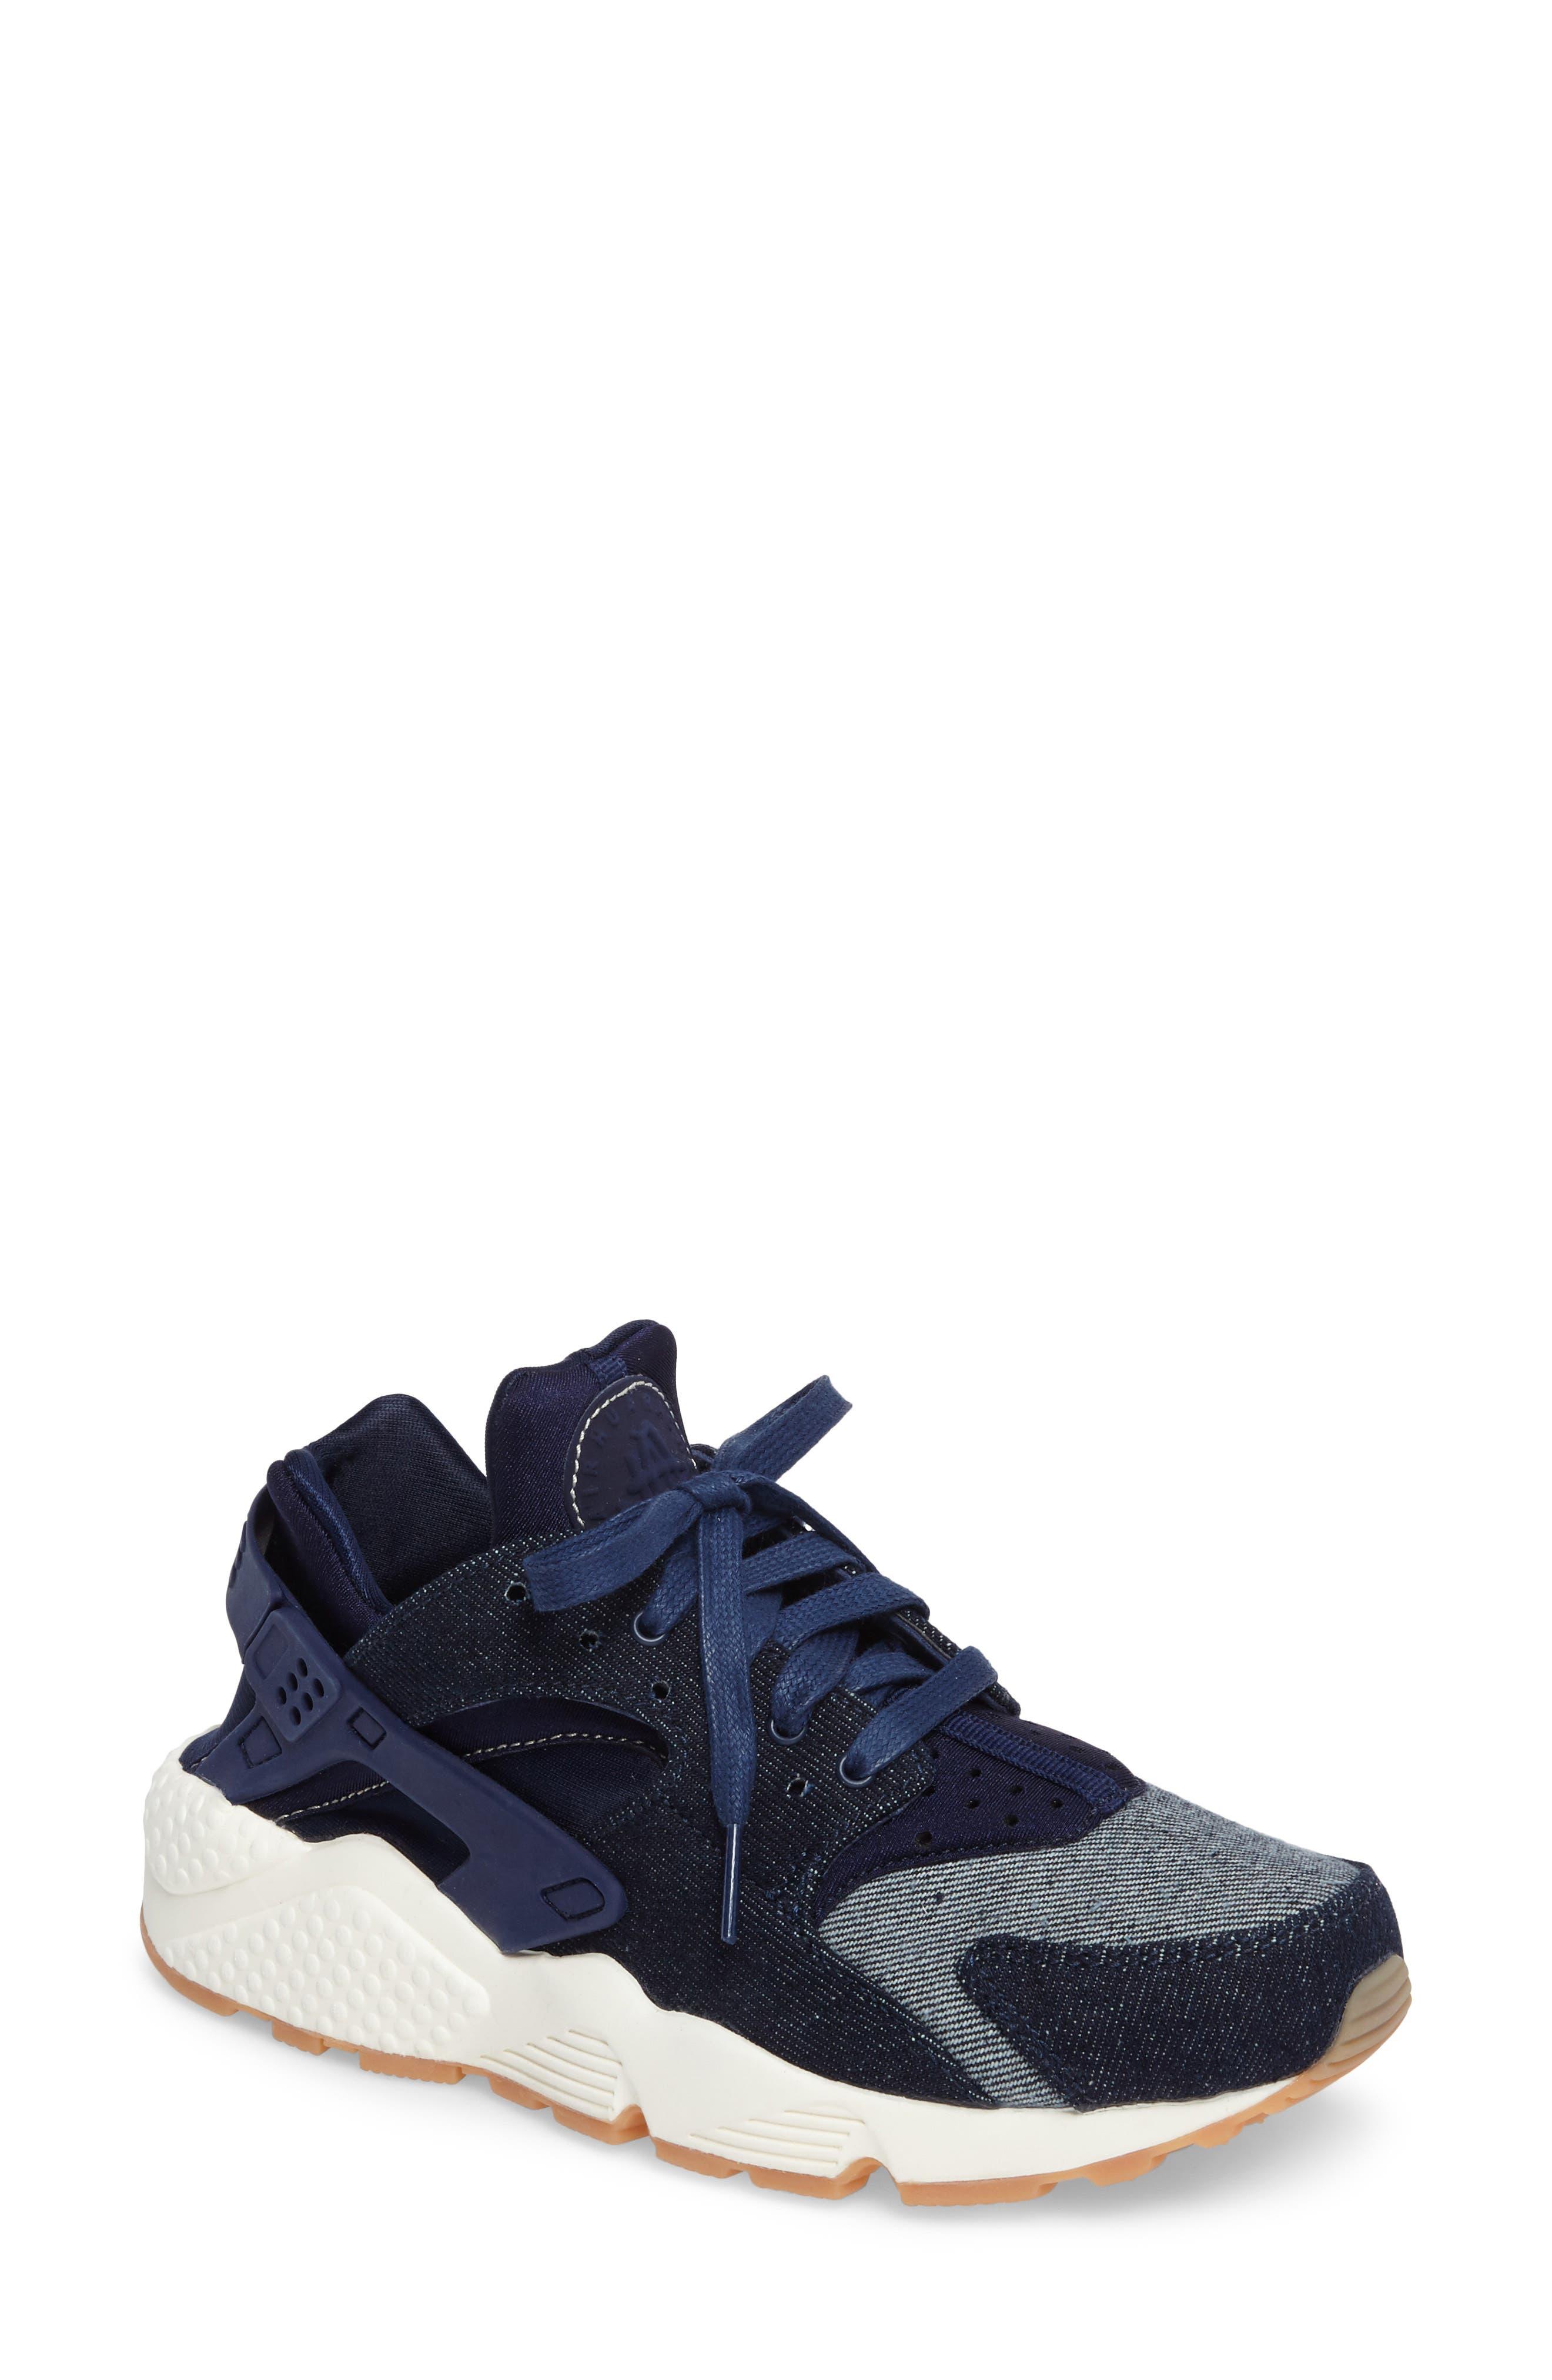 Nike Air Huarache Run SE Sneaker (Women)